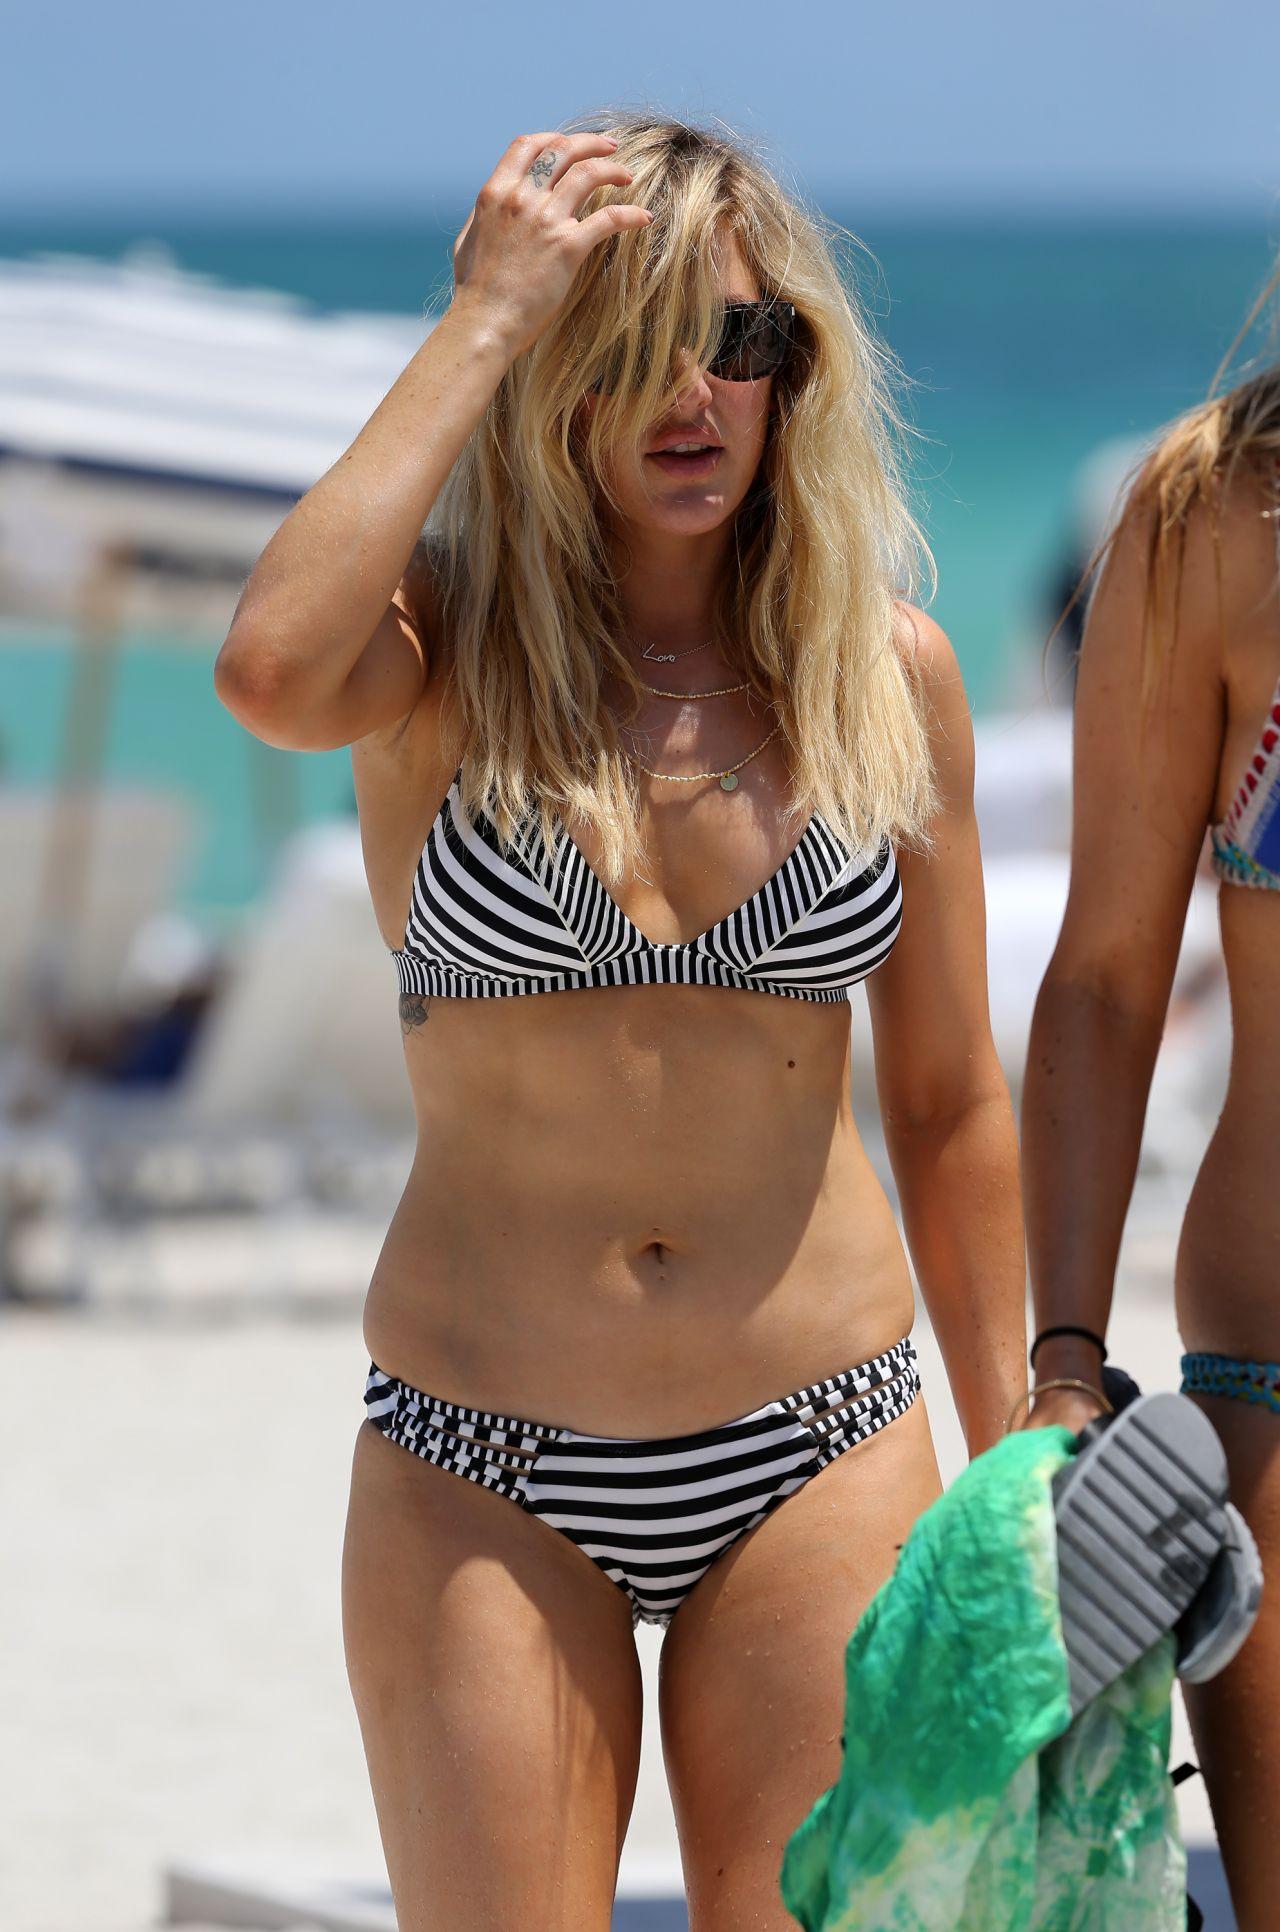 Ellie Goulding Bikini Photos Beach In Miami 4 28 2016